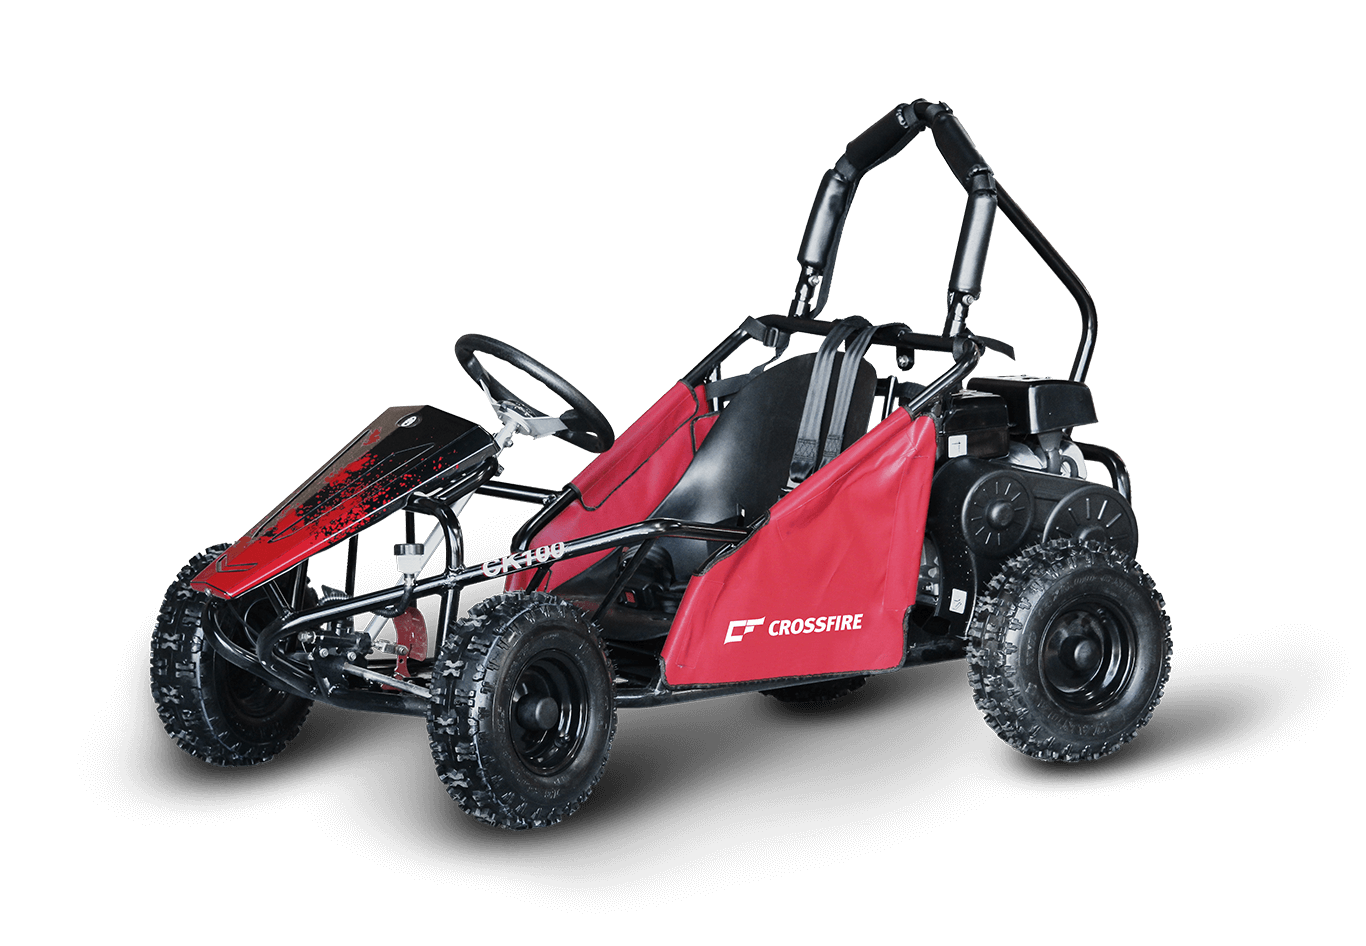 Crossfire Go-Kart 100 Main - go karts store dalby